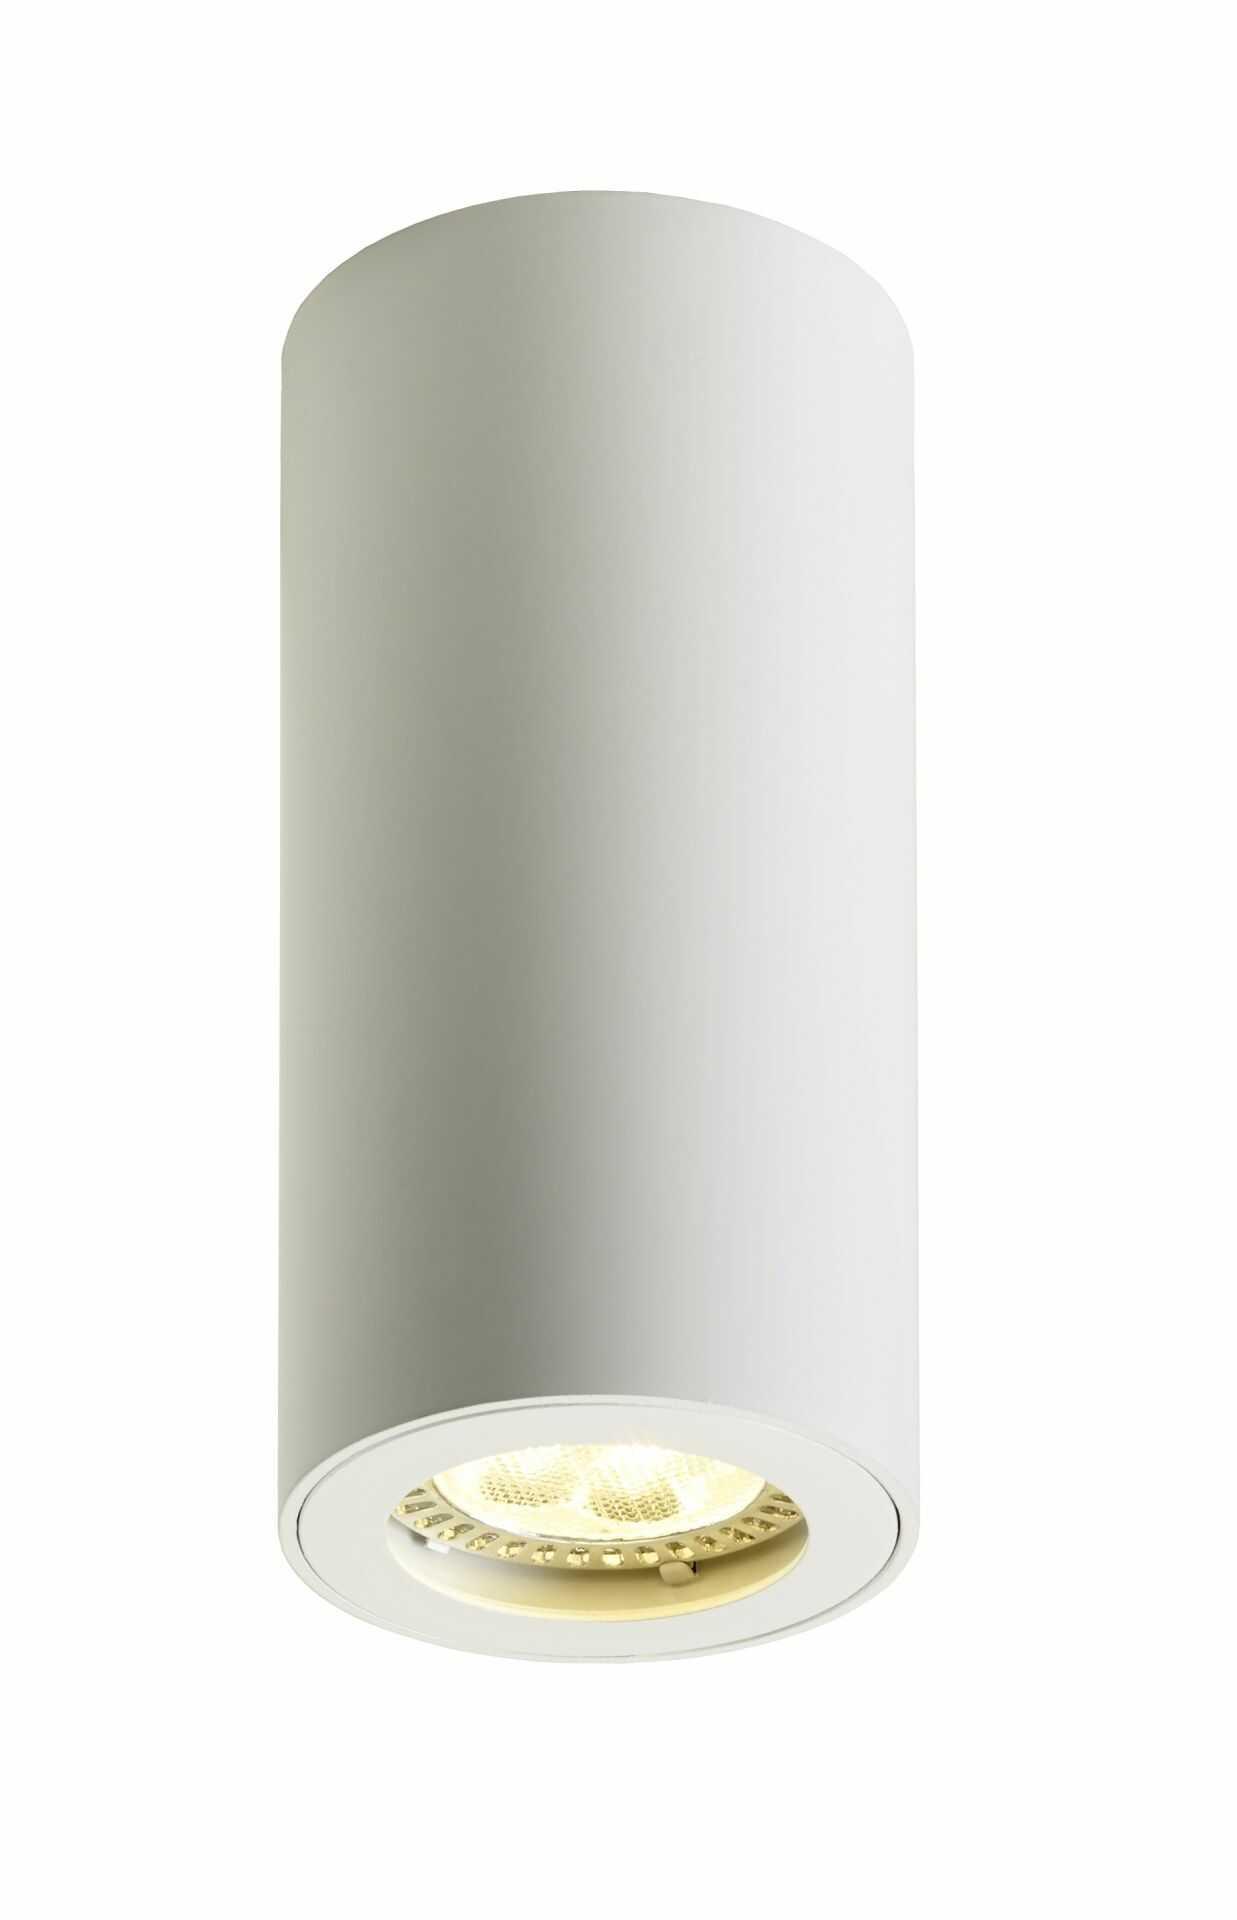 Lampa sufitowa Barlo 13 70021101 oprawa biała tuba Kaspa